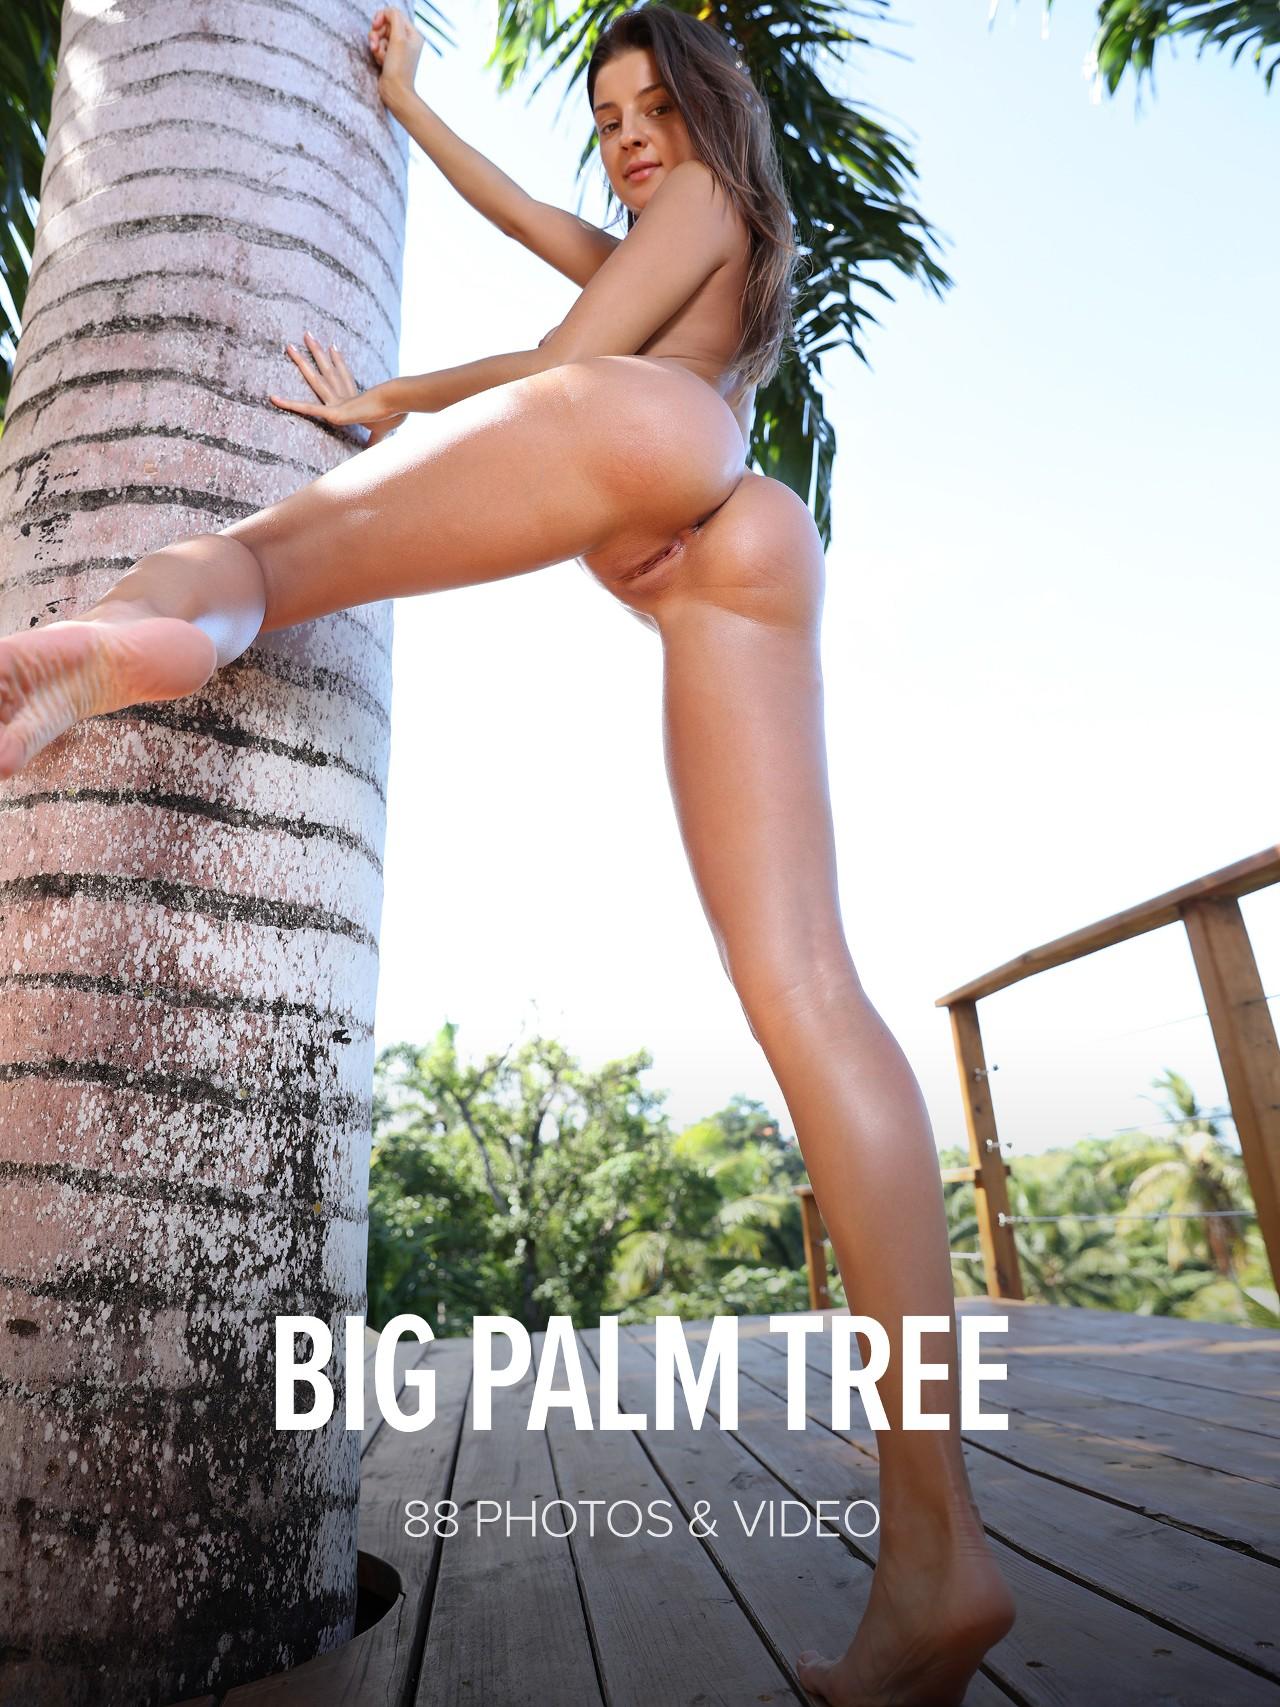 Maria: Big Palm Tree